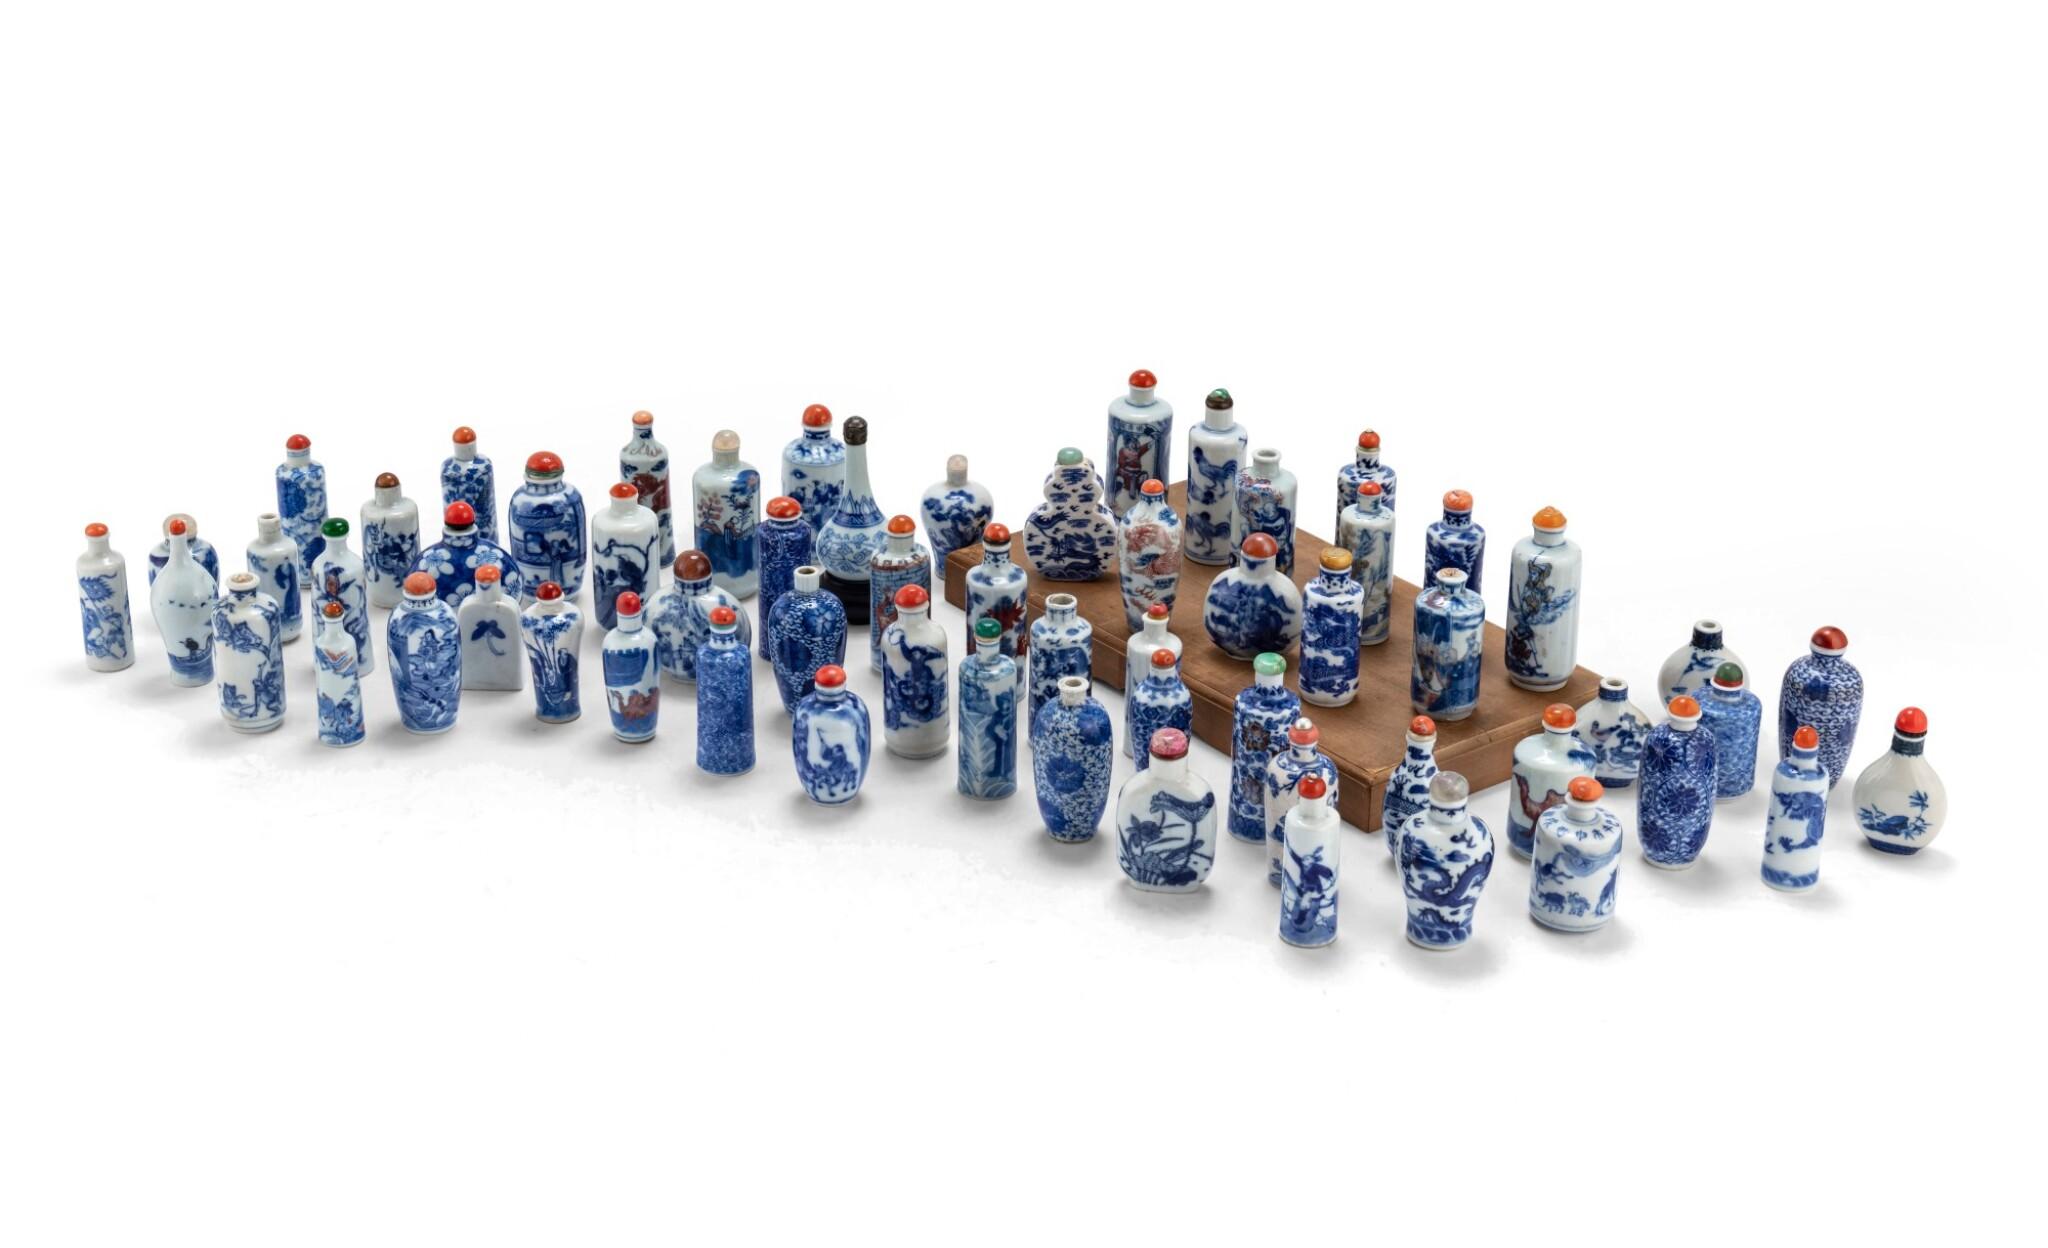 View 1 of Lot 233. Ensemble de 62 tabatières en porcelaine bleu blanc Dynastie Qing, XVIIIE-XXE siècle | 清十八至二十世紀 青花鼻煙壺一組六十二件 | A group of sixty-two blue and white snuff bottles, Qing Dynasty, 18th-20th century.